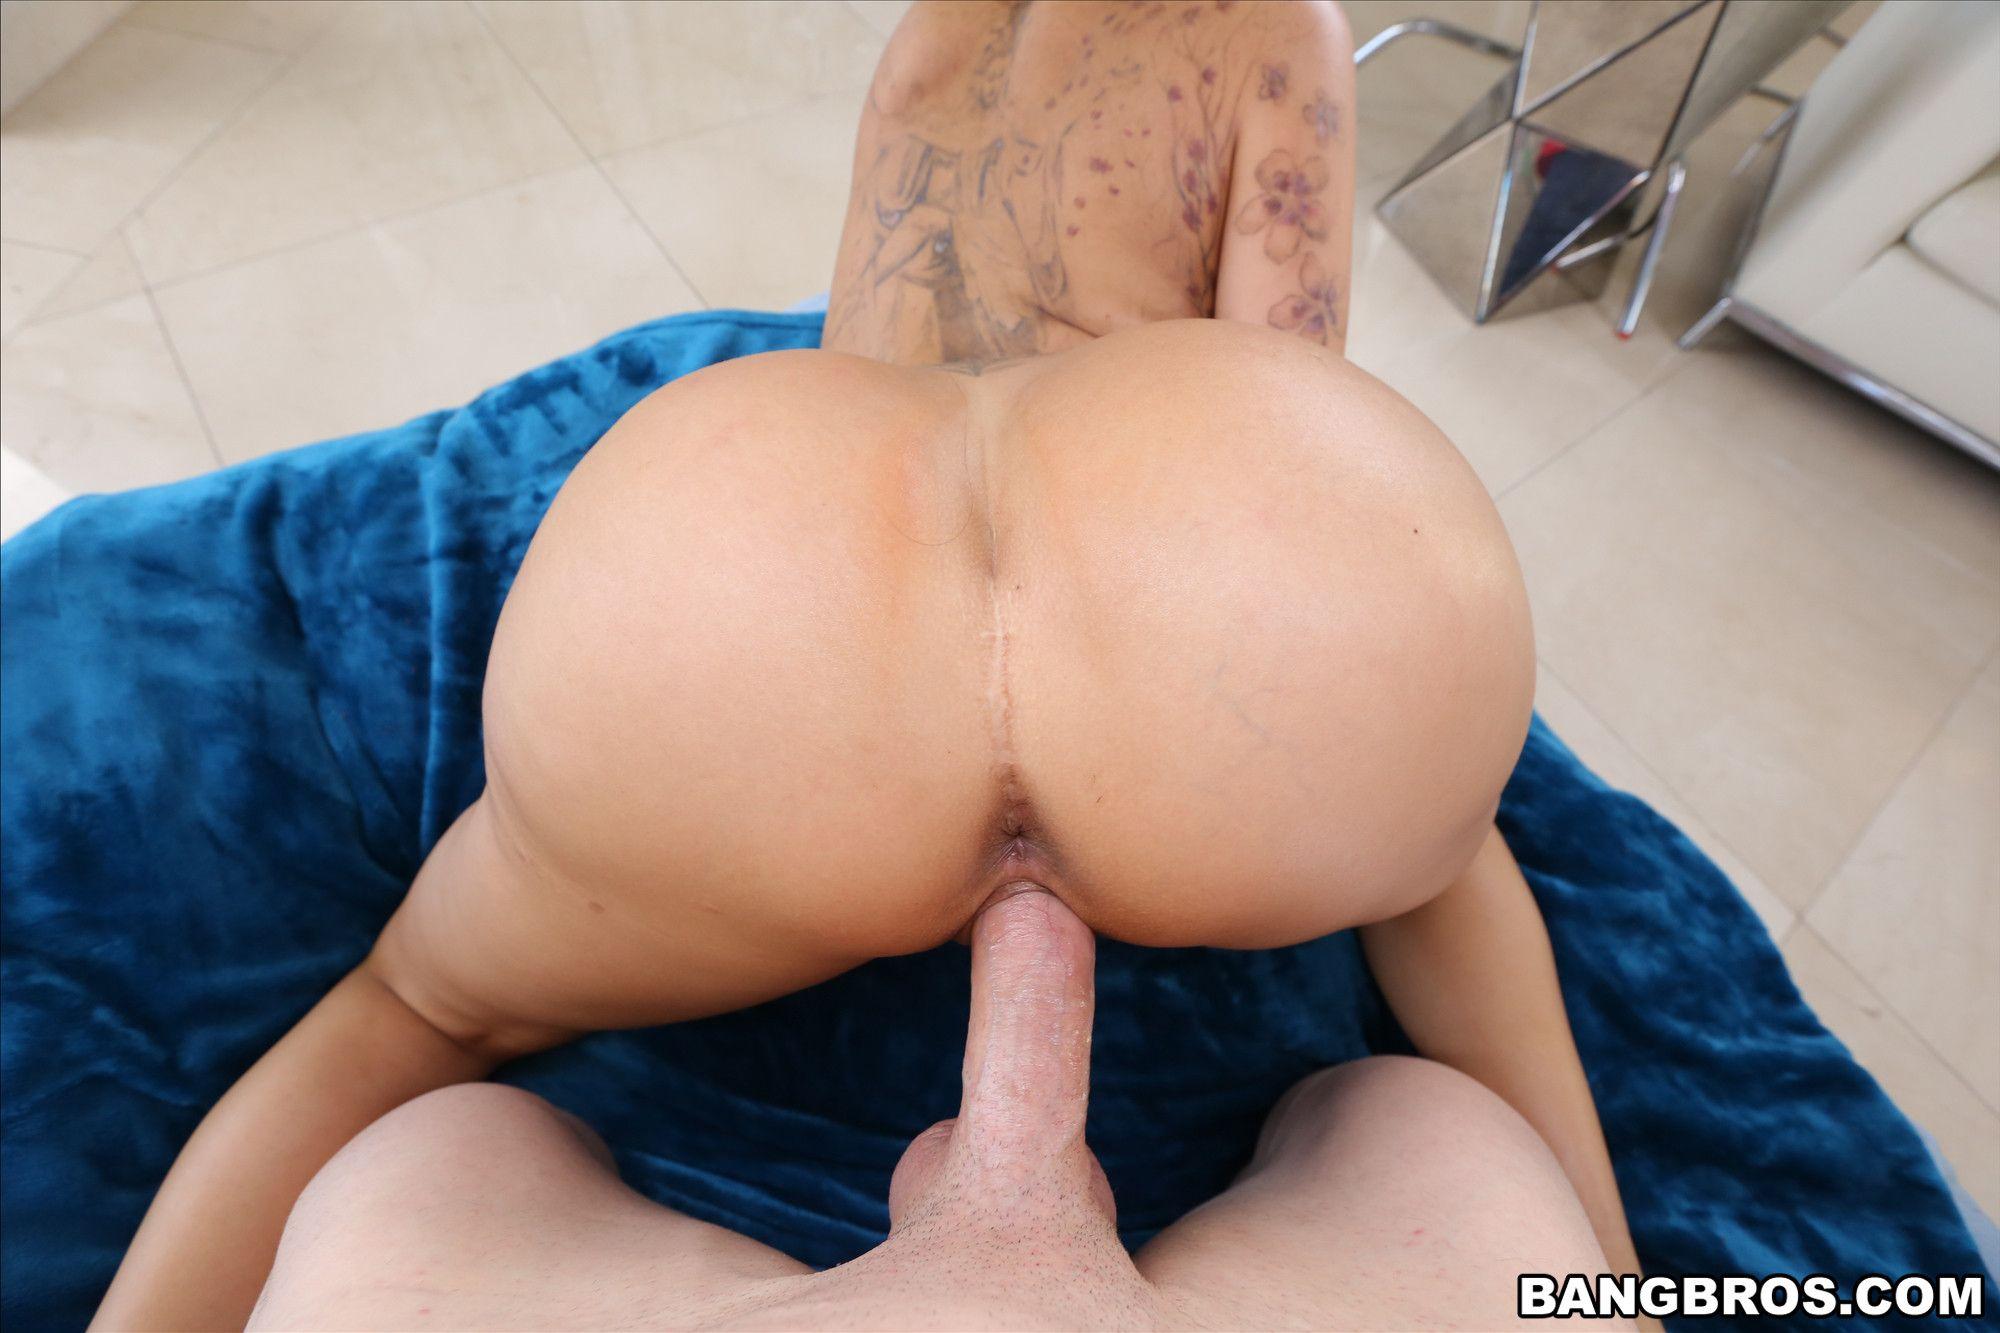 Pornstar lela star bouncing her enormous ass on his boner